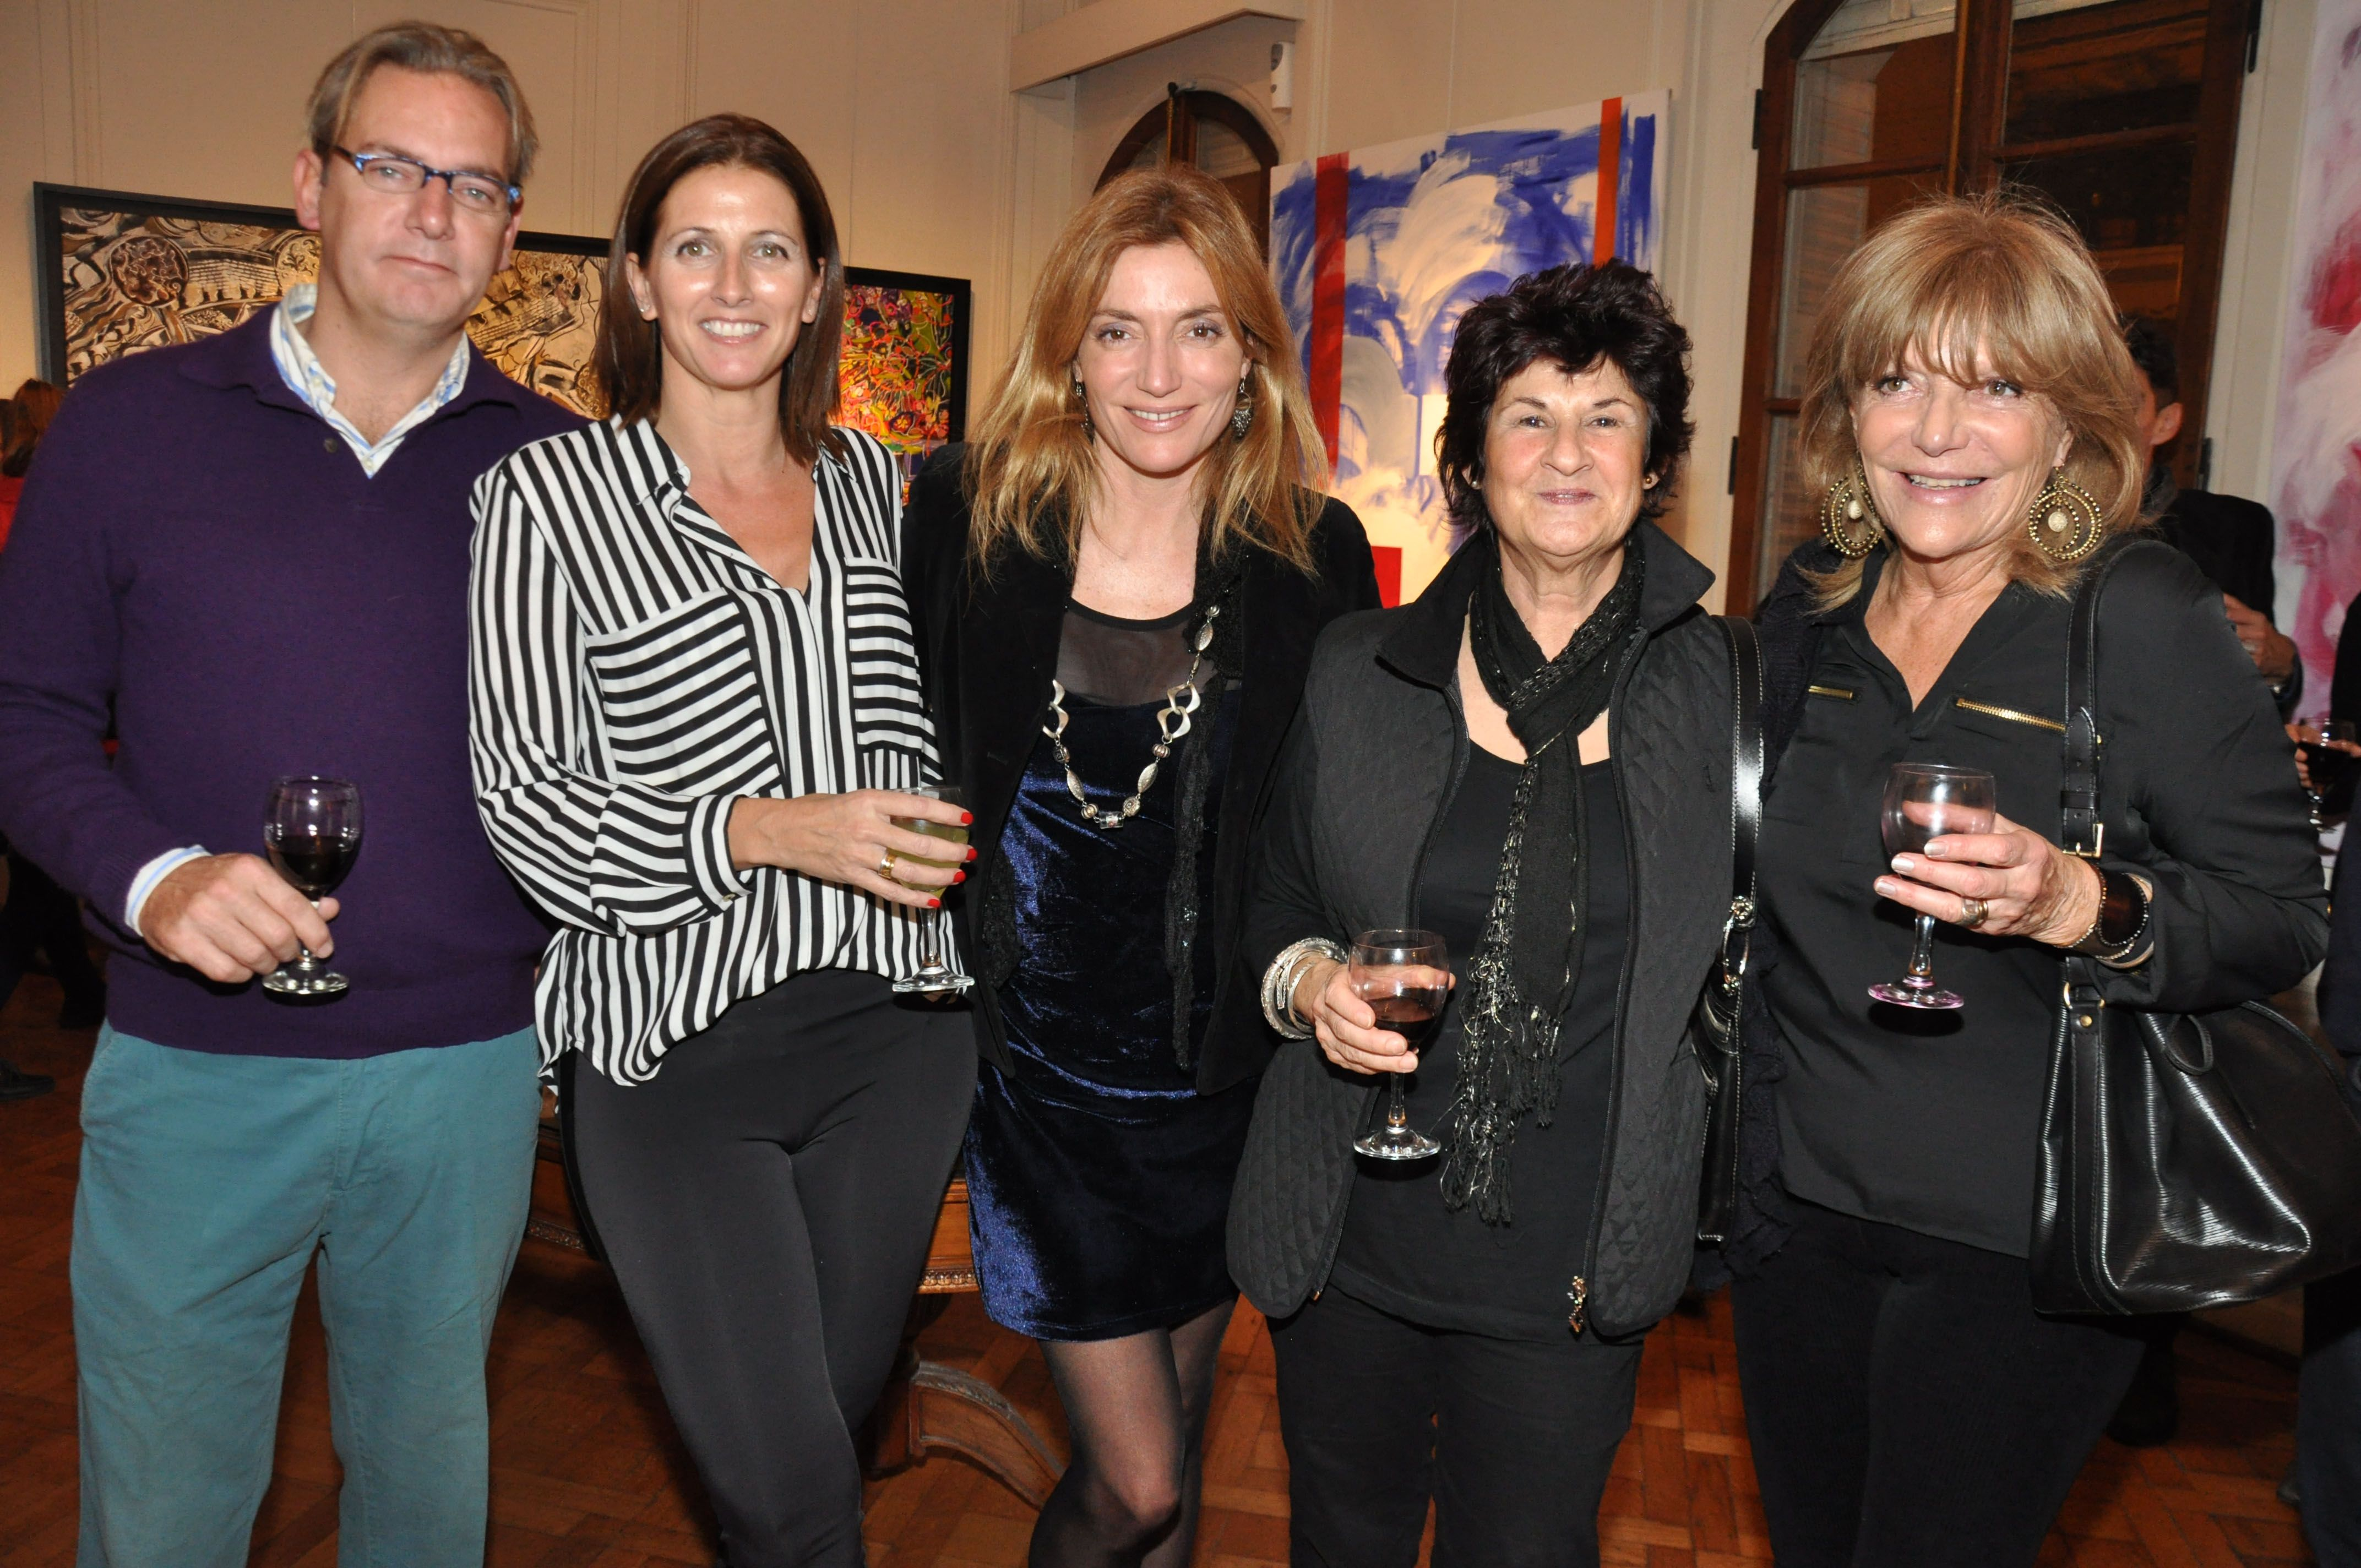 Sebastián Airaldi, Valeria Diz, Carmen Darldalla